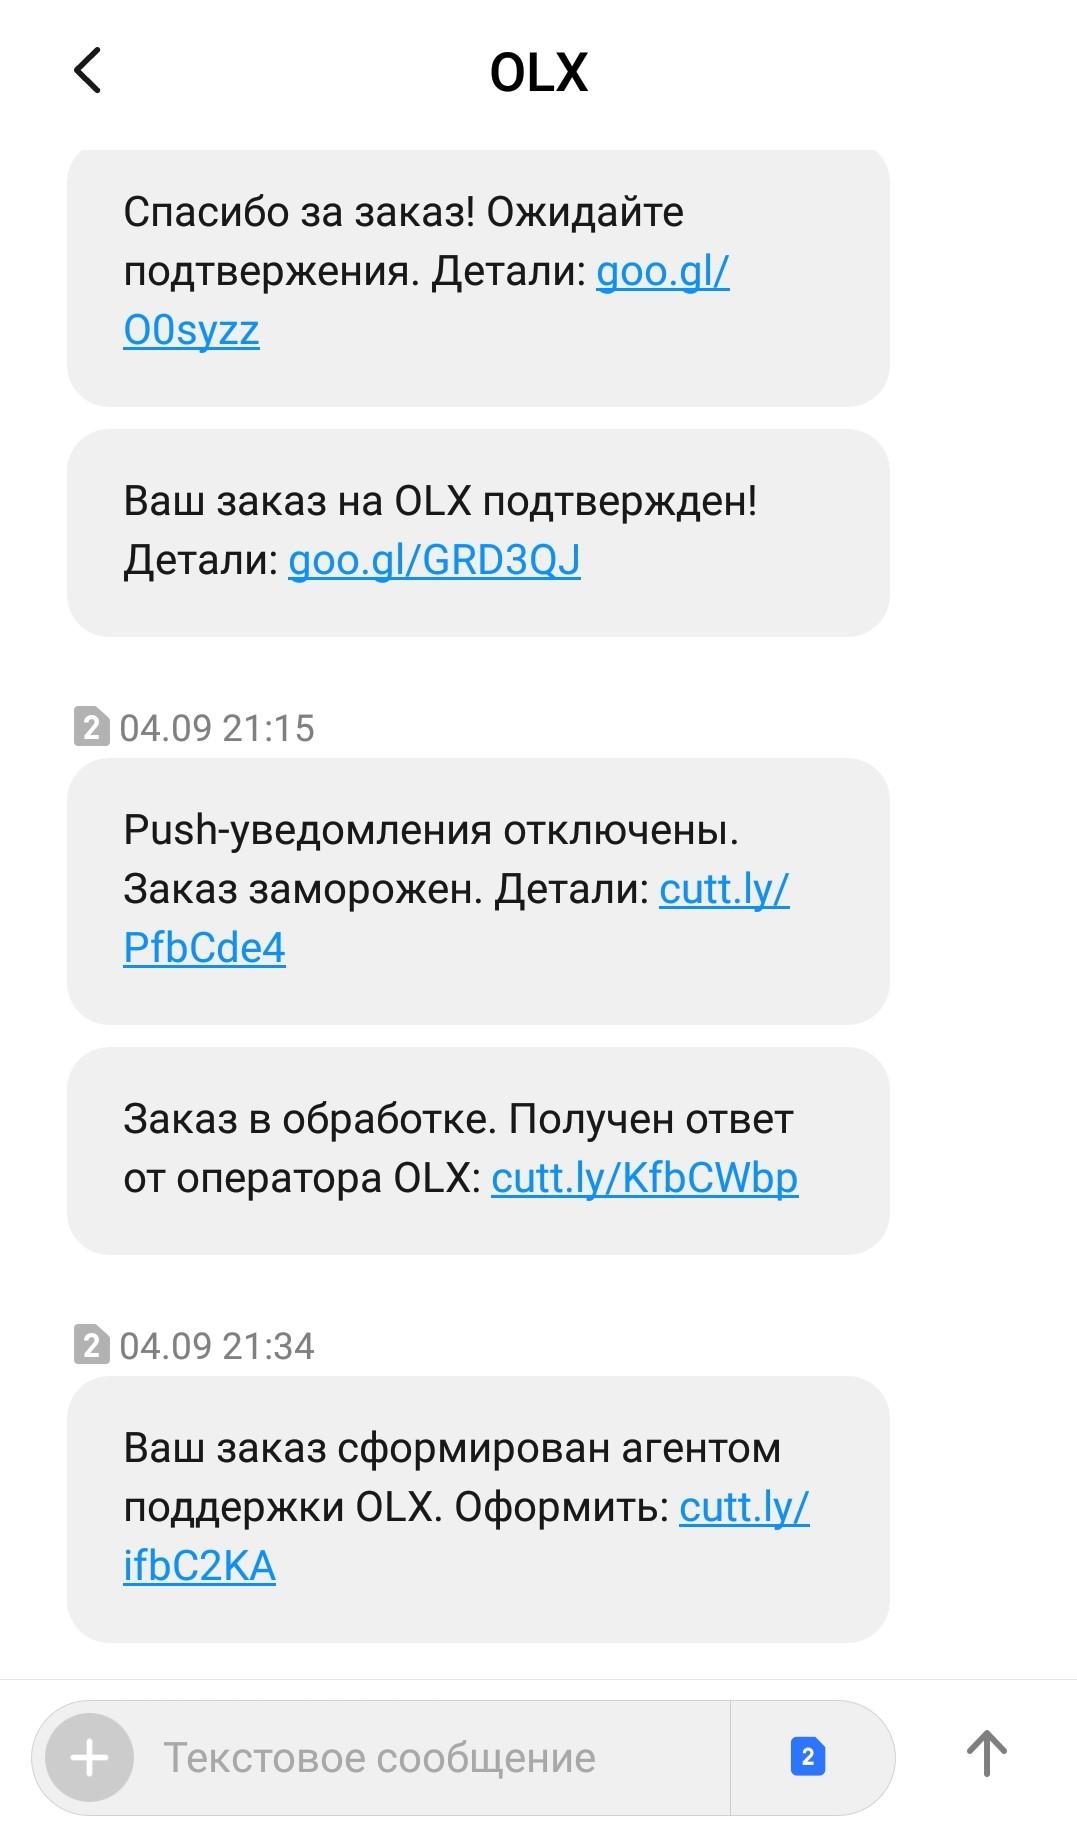 Screenshot_2020-09-05-00-37-17-600_com.android.mms.jpg (204 KB)